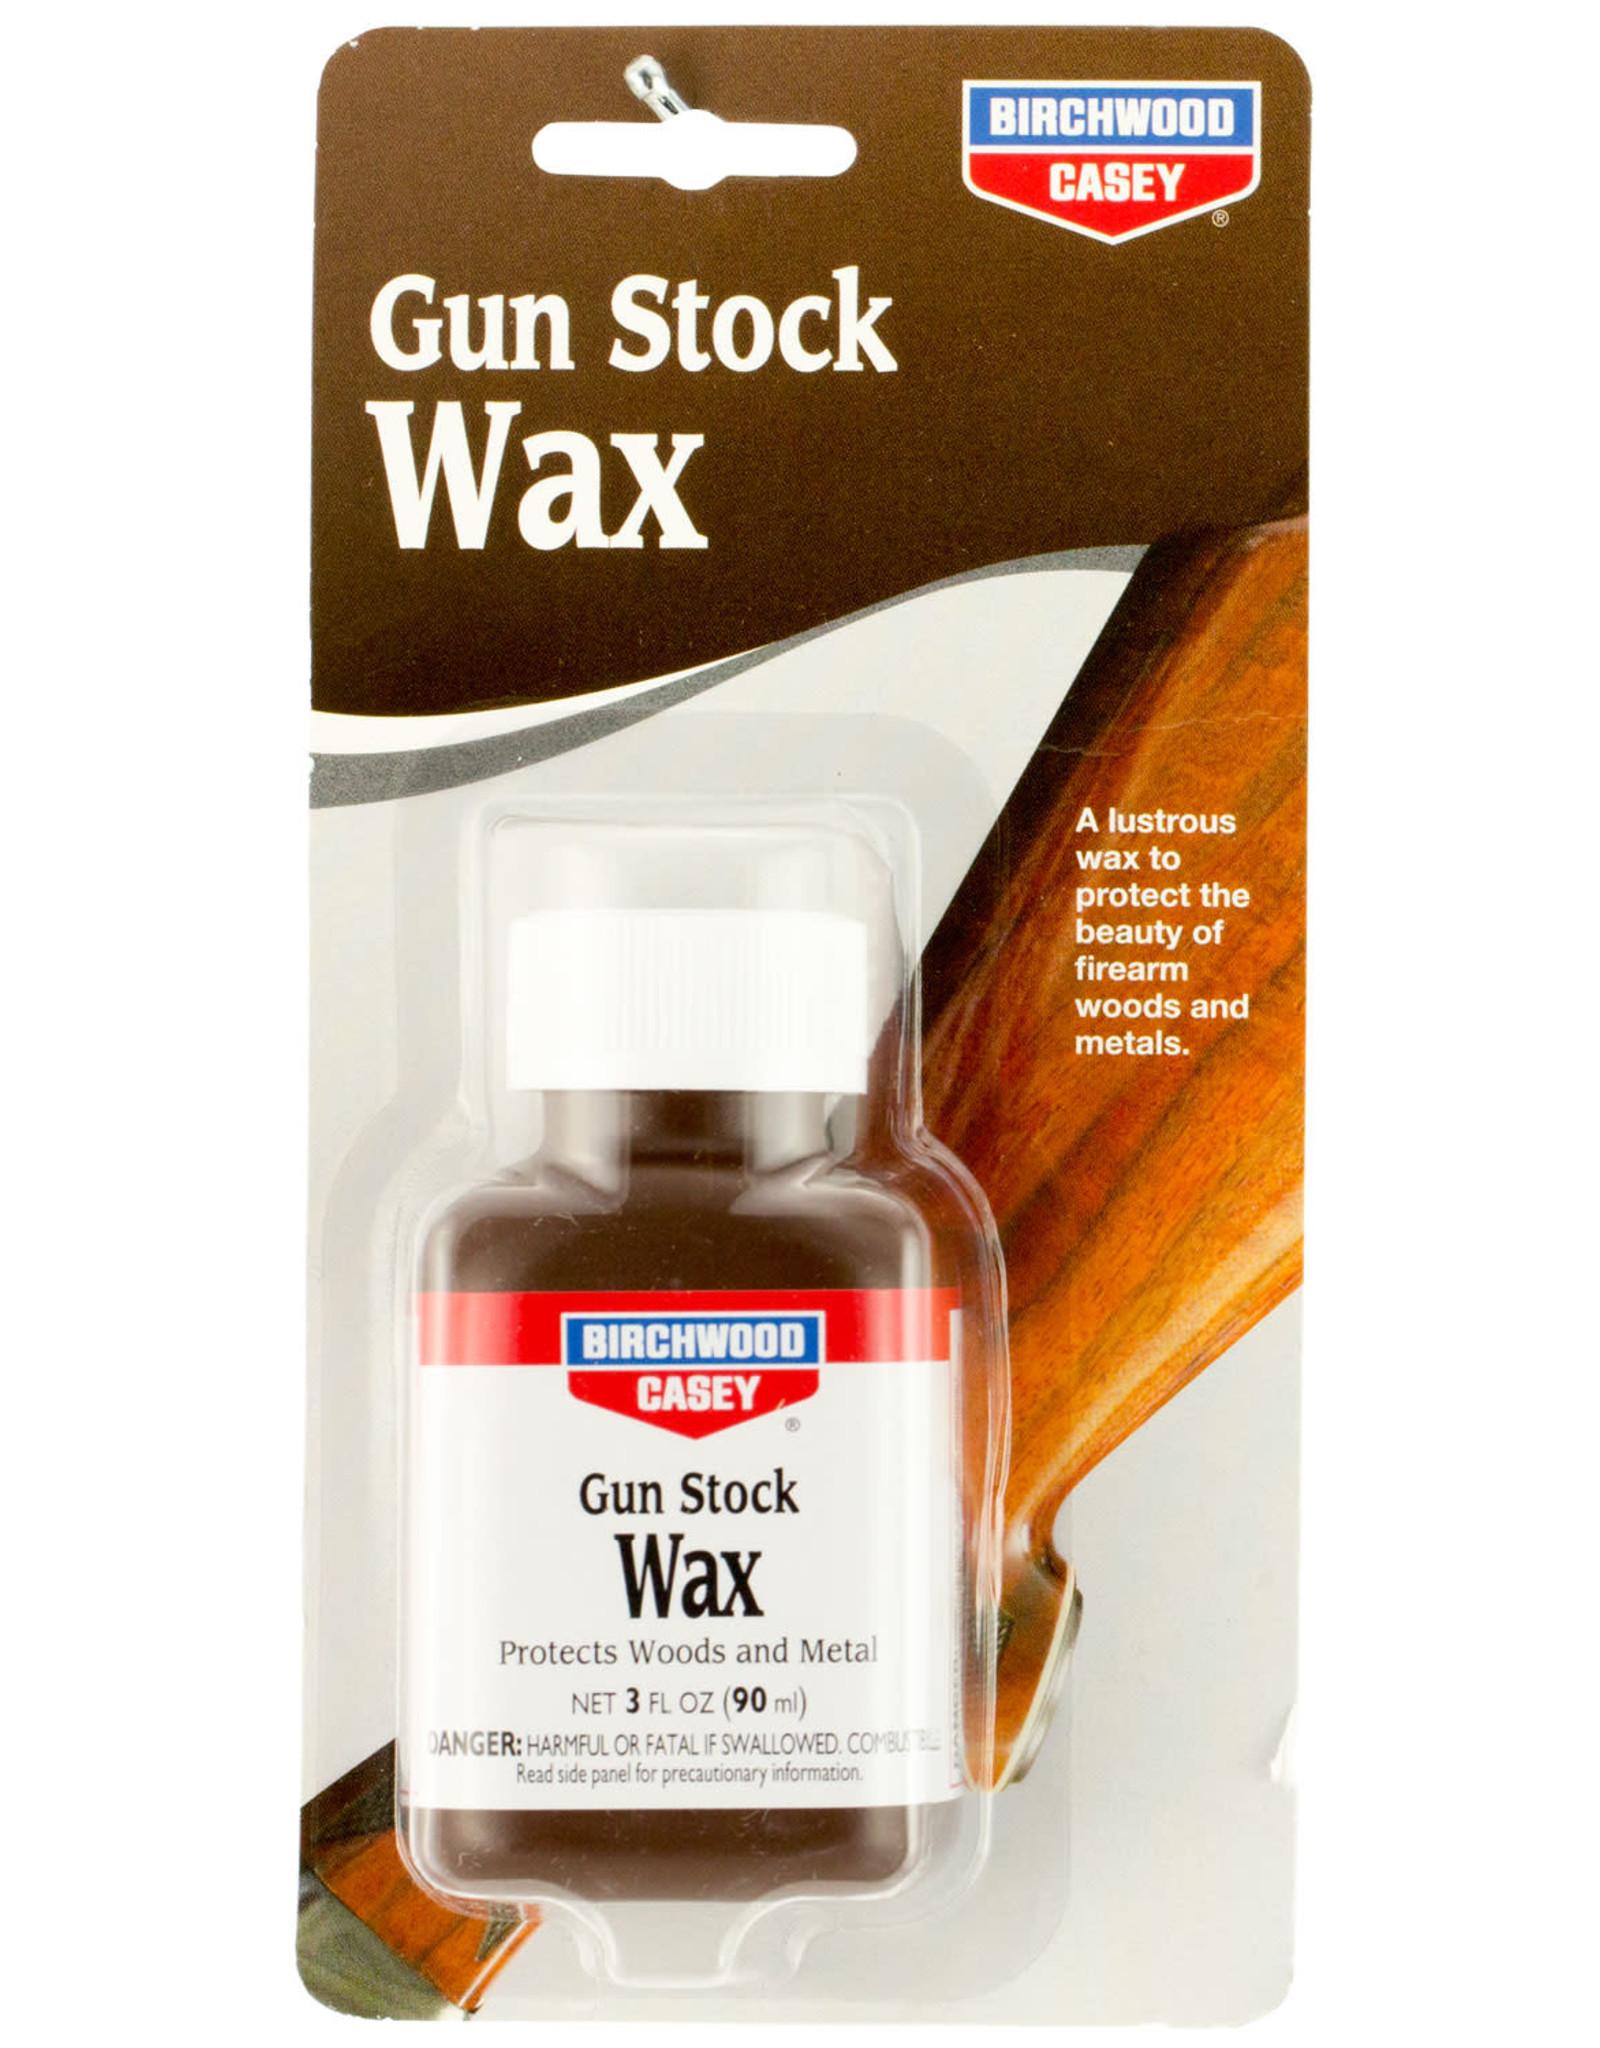 BIRCHWOOD CASEY Birchwood Casey  Gun Stock Wax 3oz